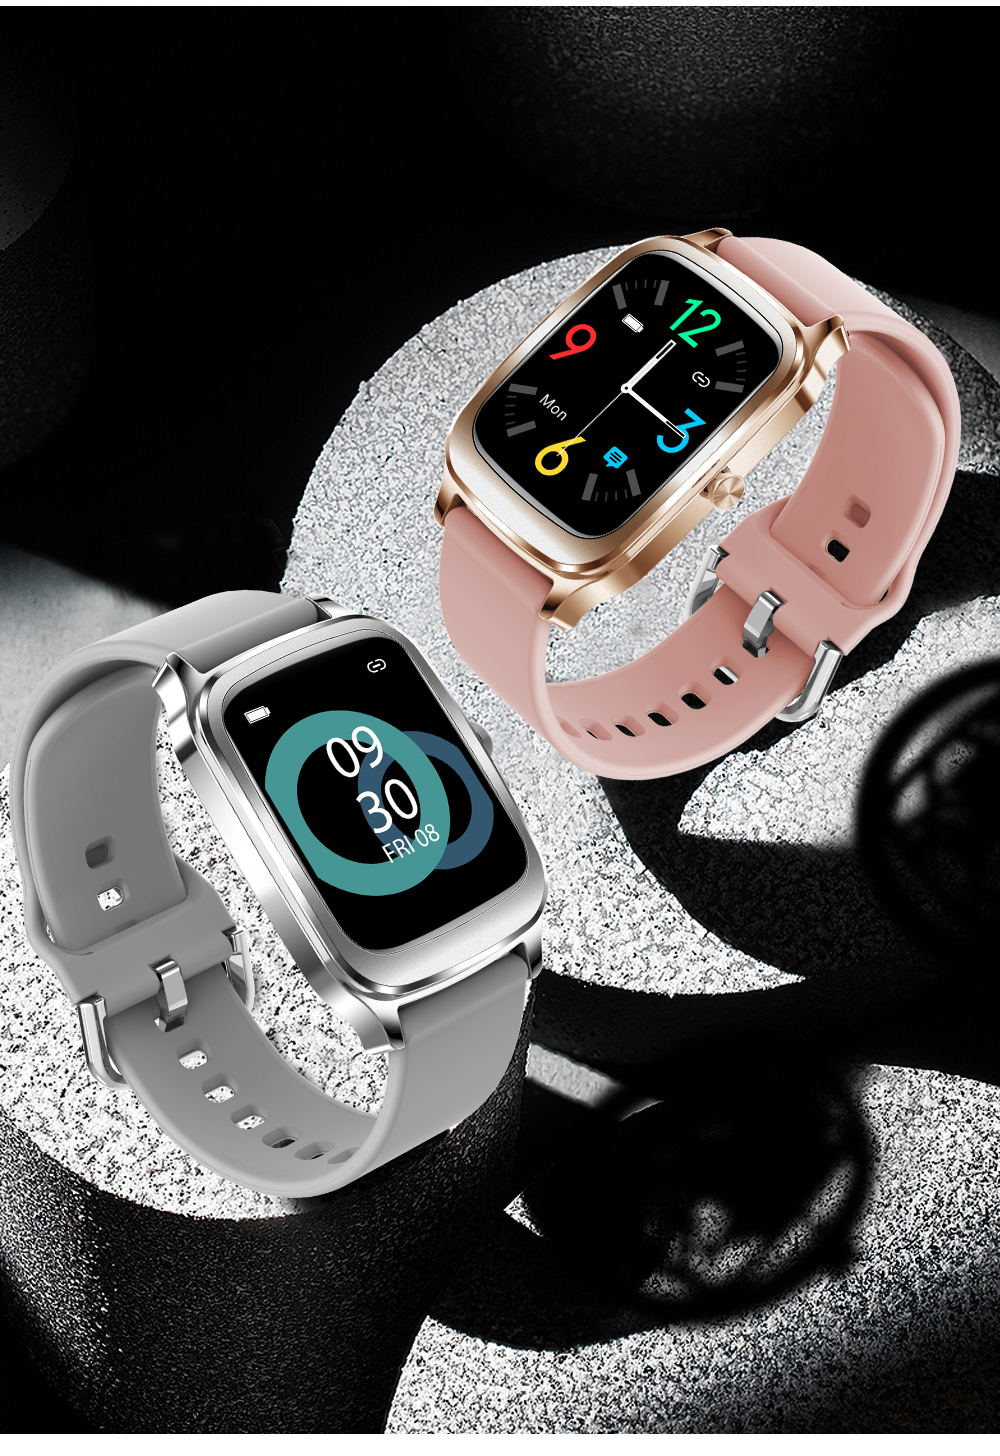 Nova moda confortável haylou h68 relógio inteligente,